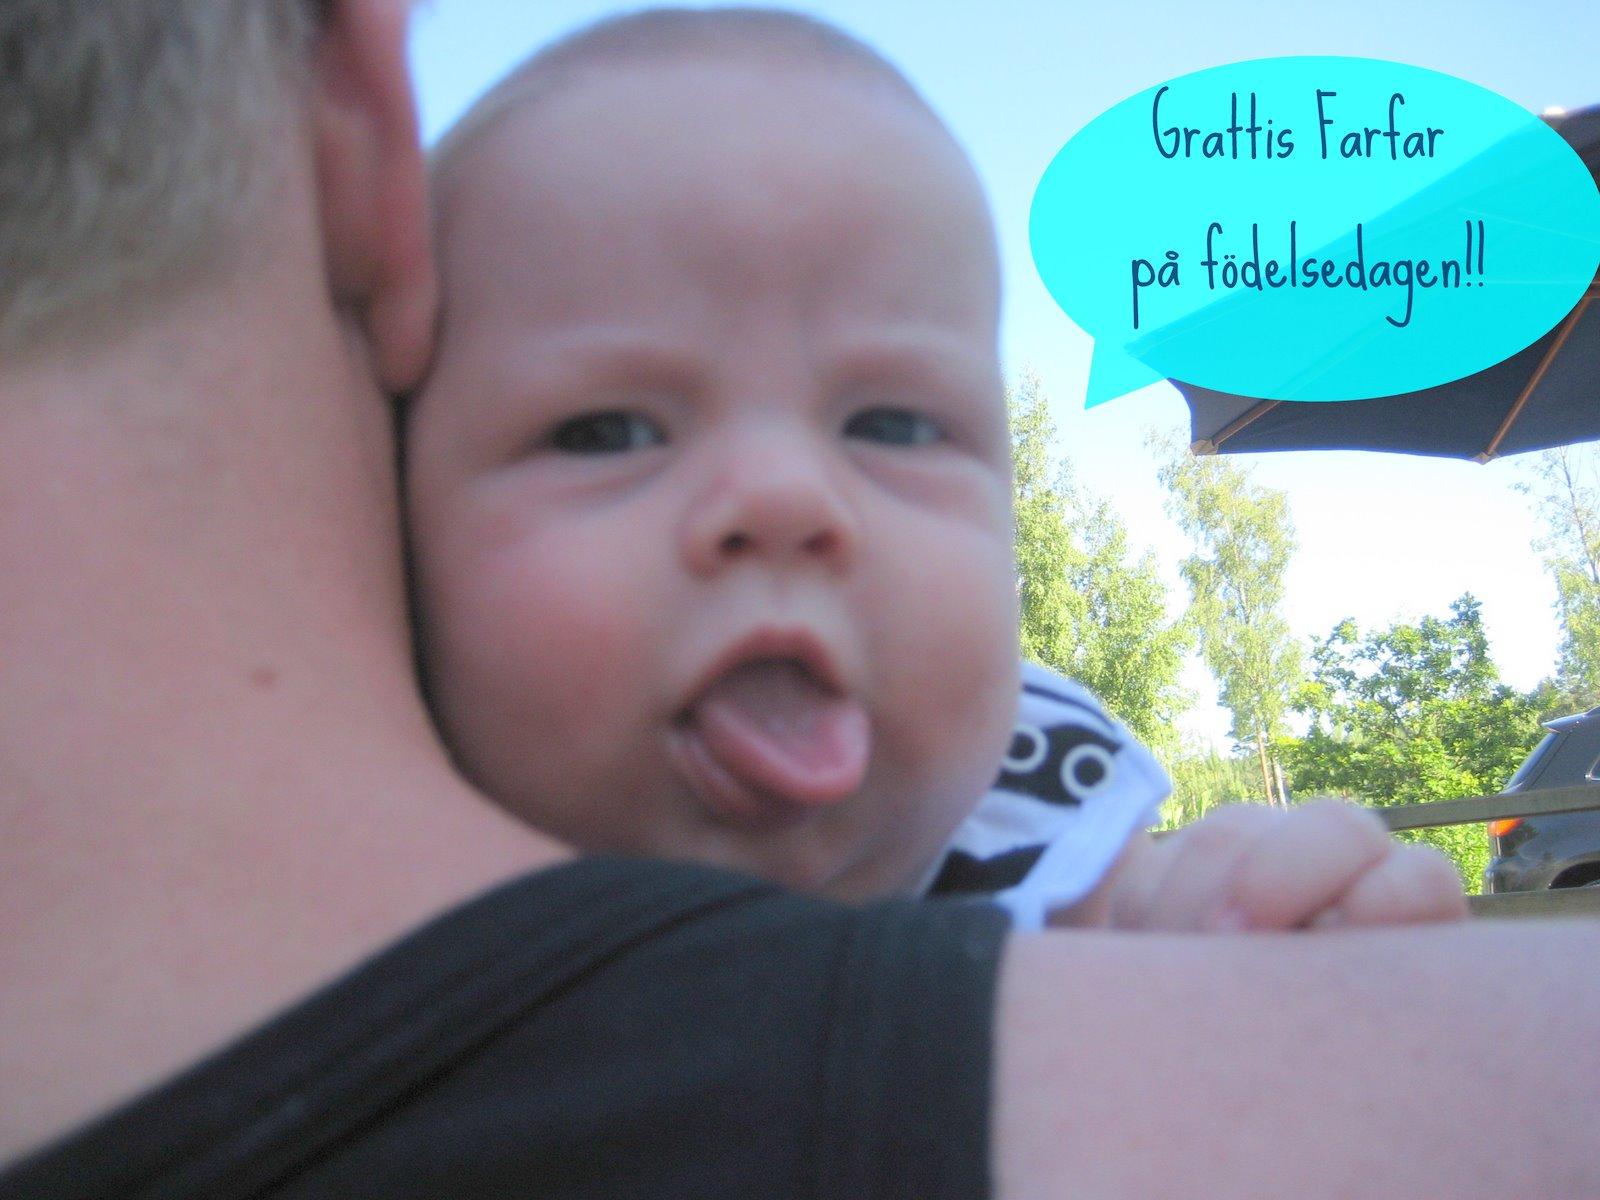 grattis farfar bad voice whispering bad things: Grattis farfar grattis farfar